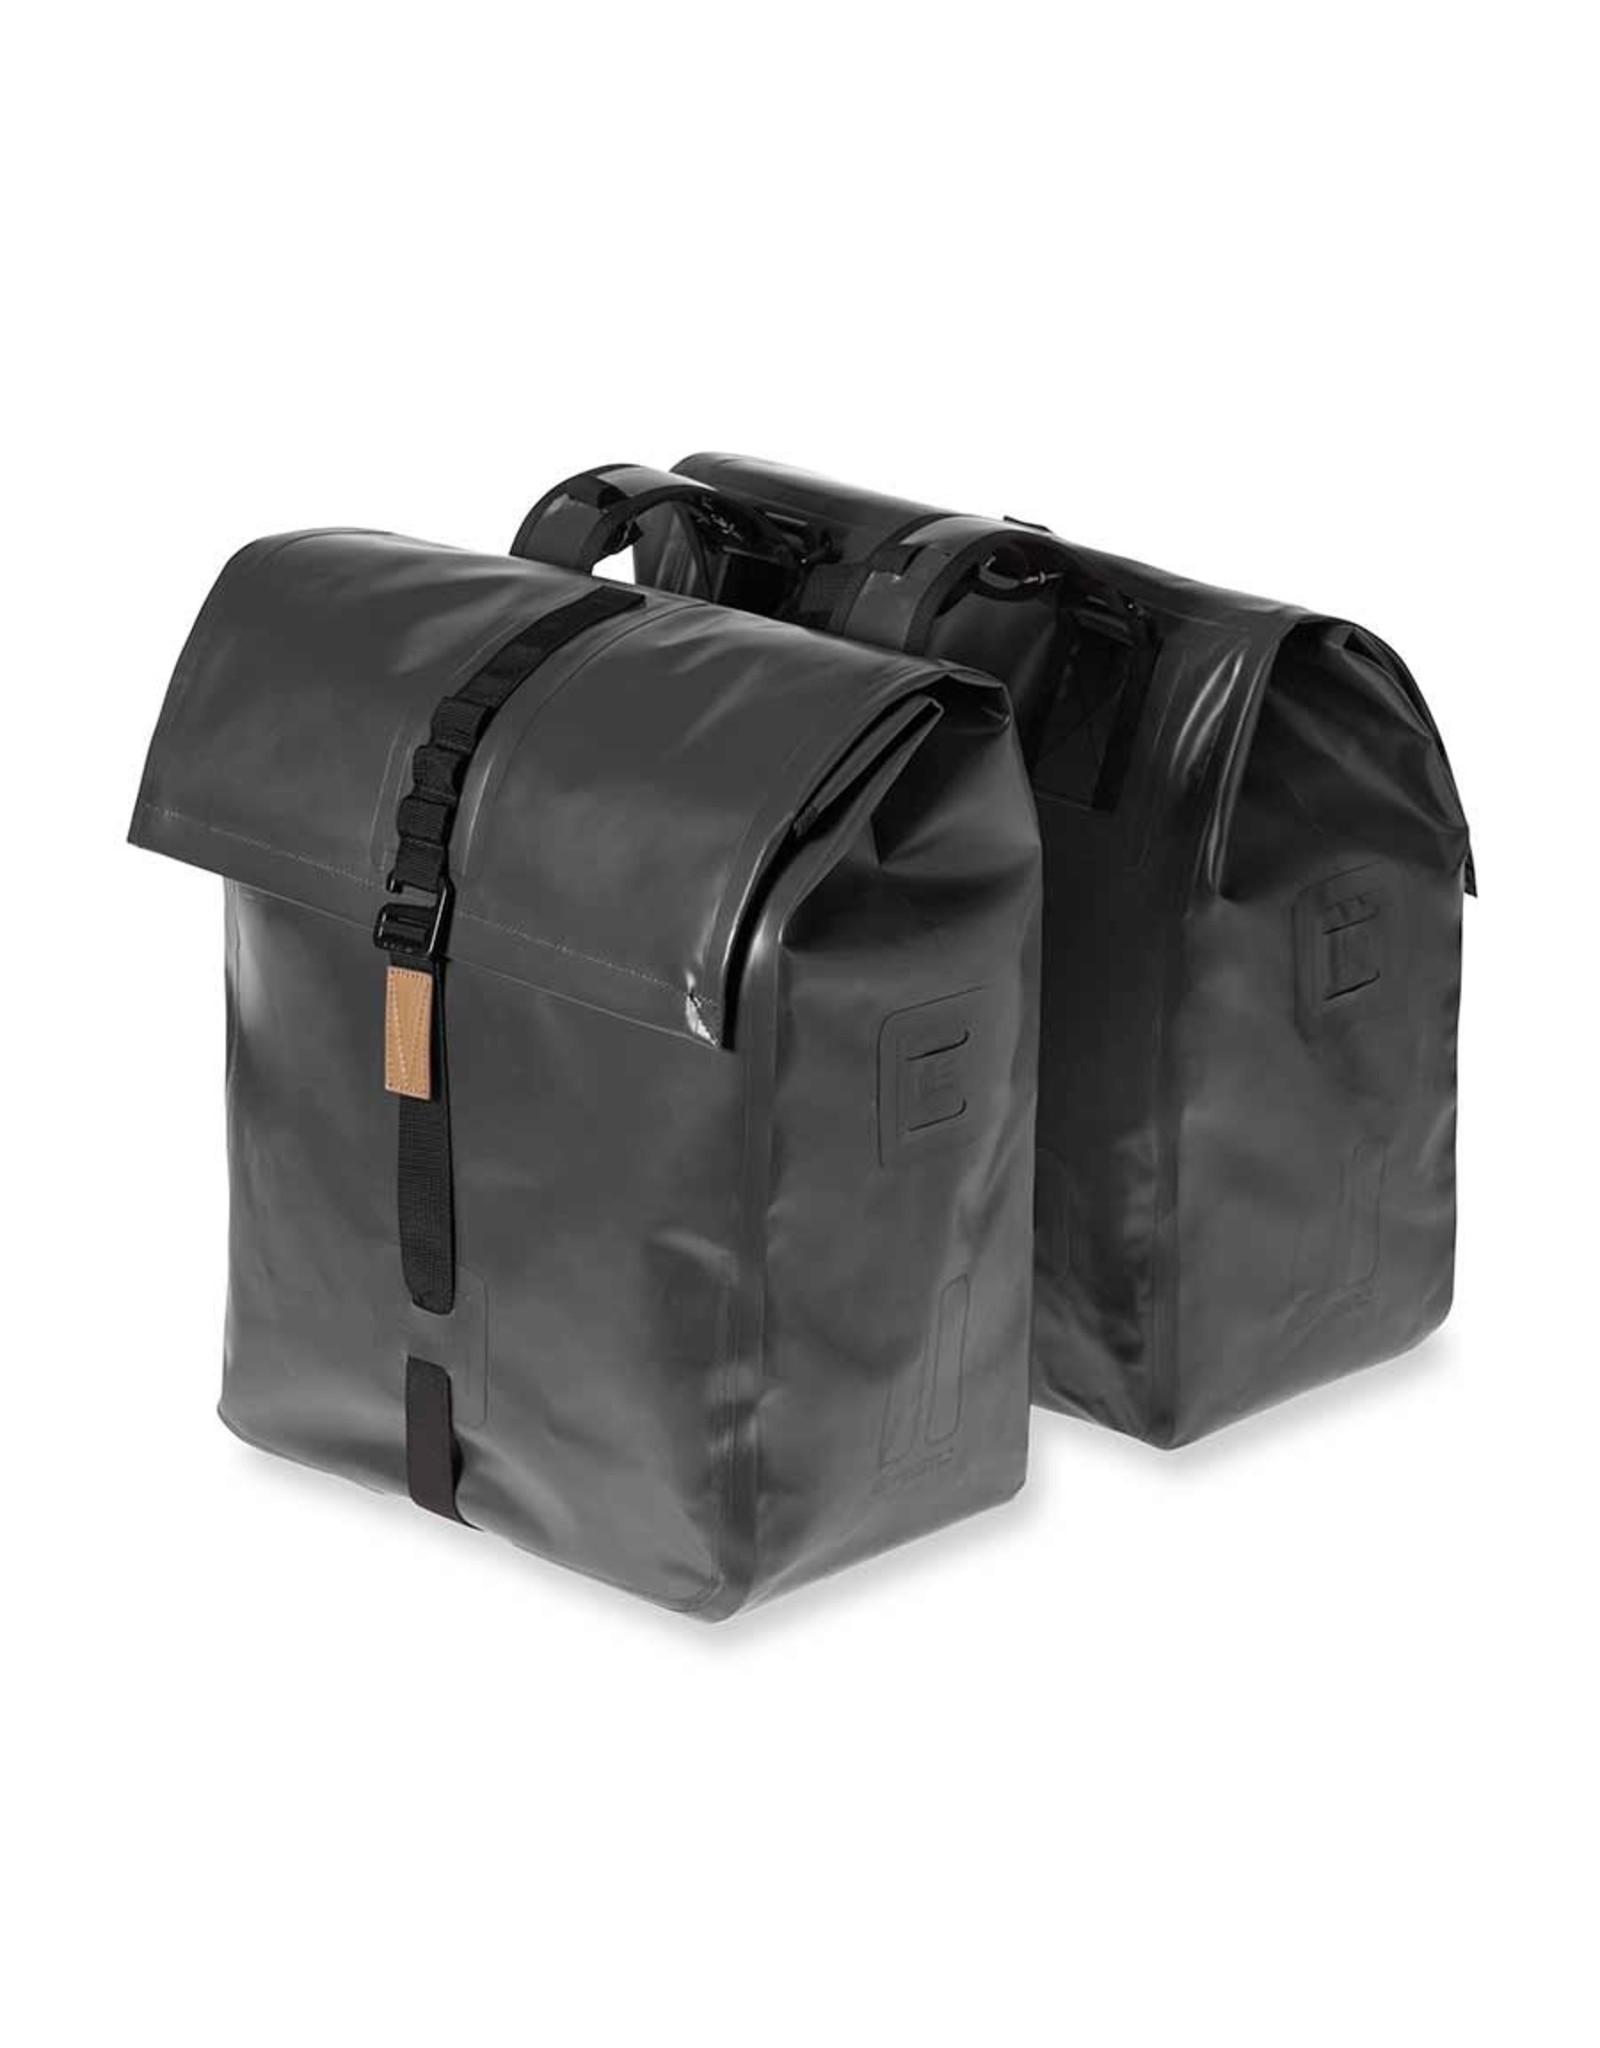 Basil Basil, Urban Dry Double Bag, Double bag, Solid Black